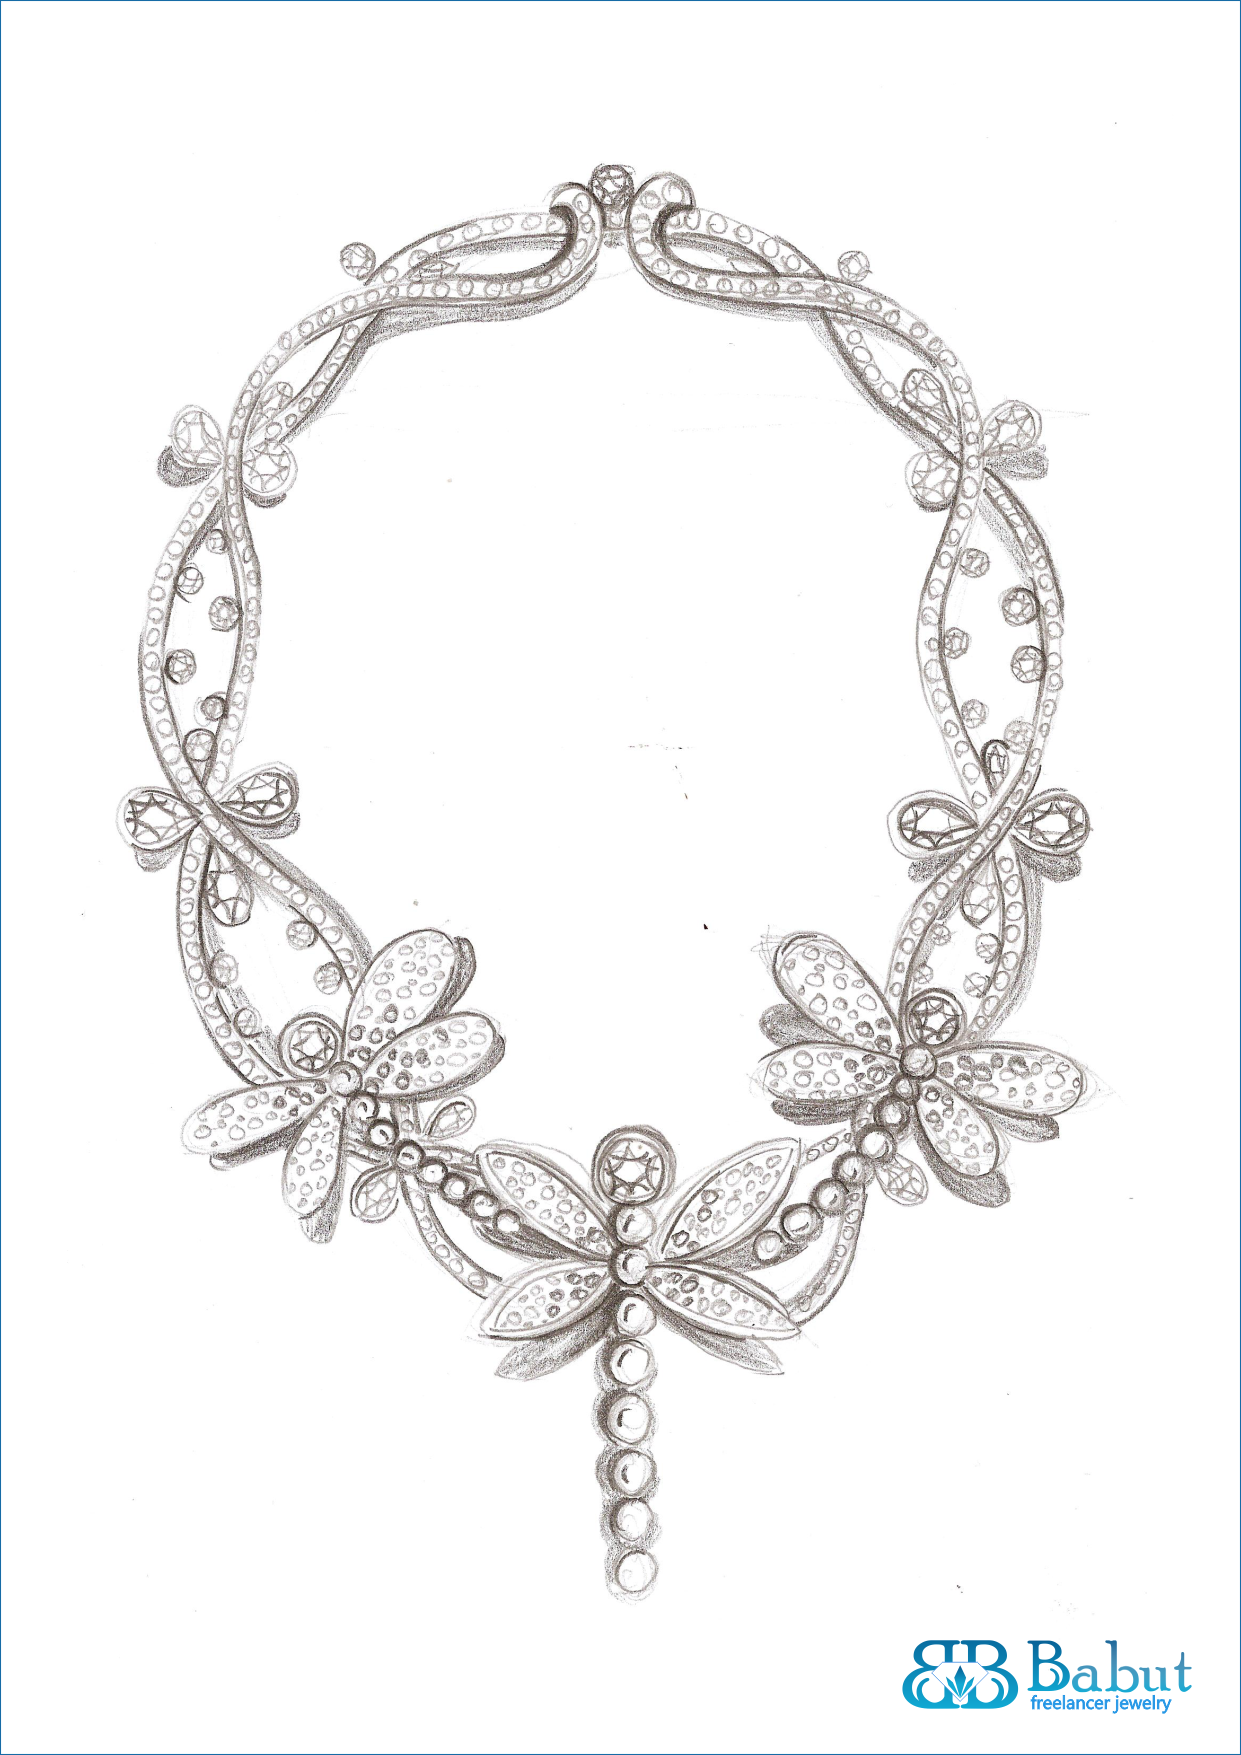 sketches jewelry desigN | sketches design jewelry ...